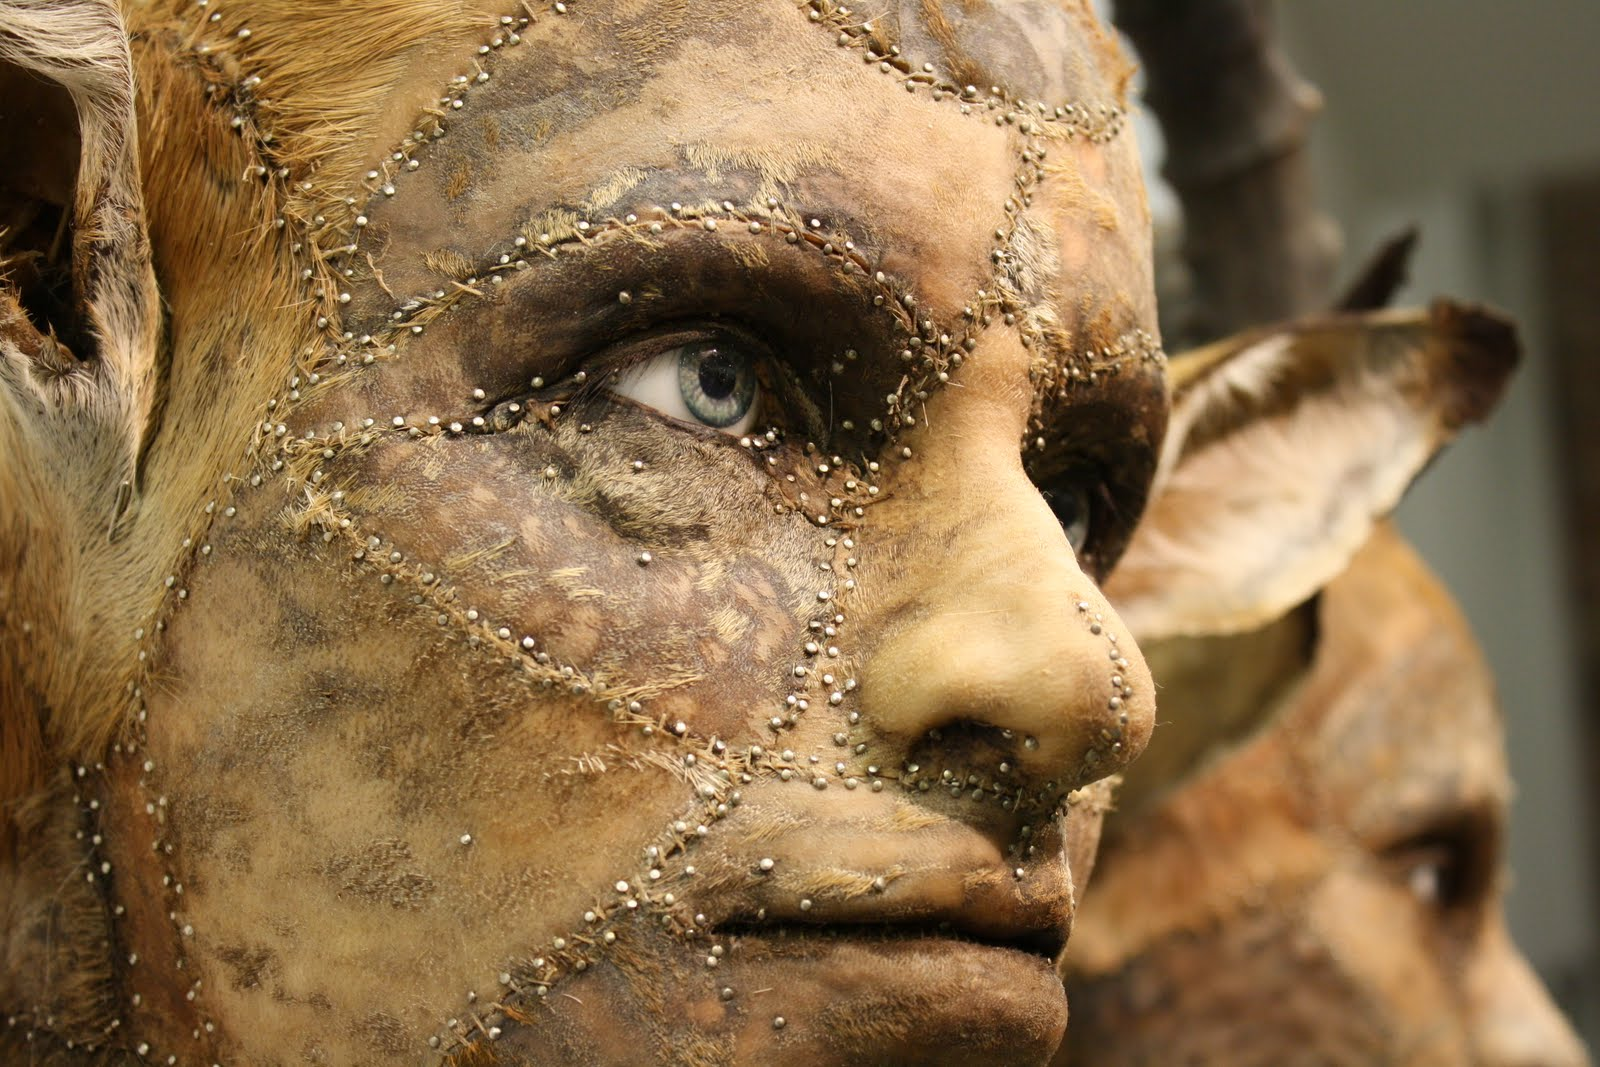 Kate Clark – taxidermie art sculpture animal / Human details